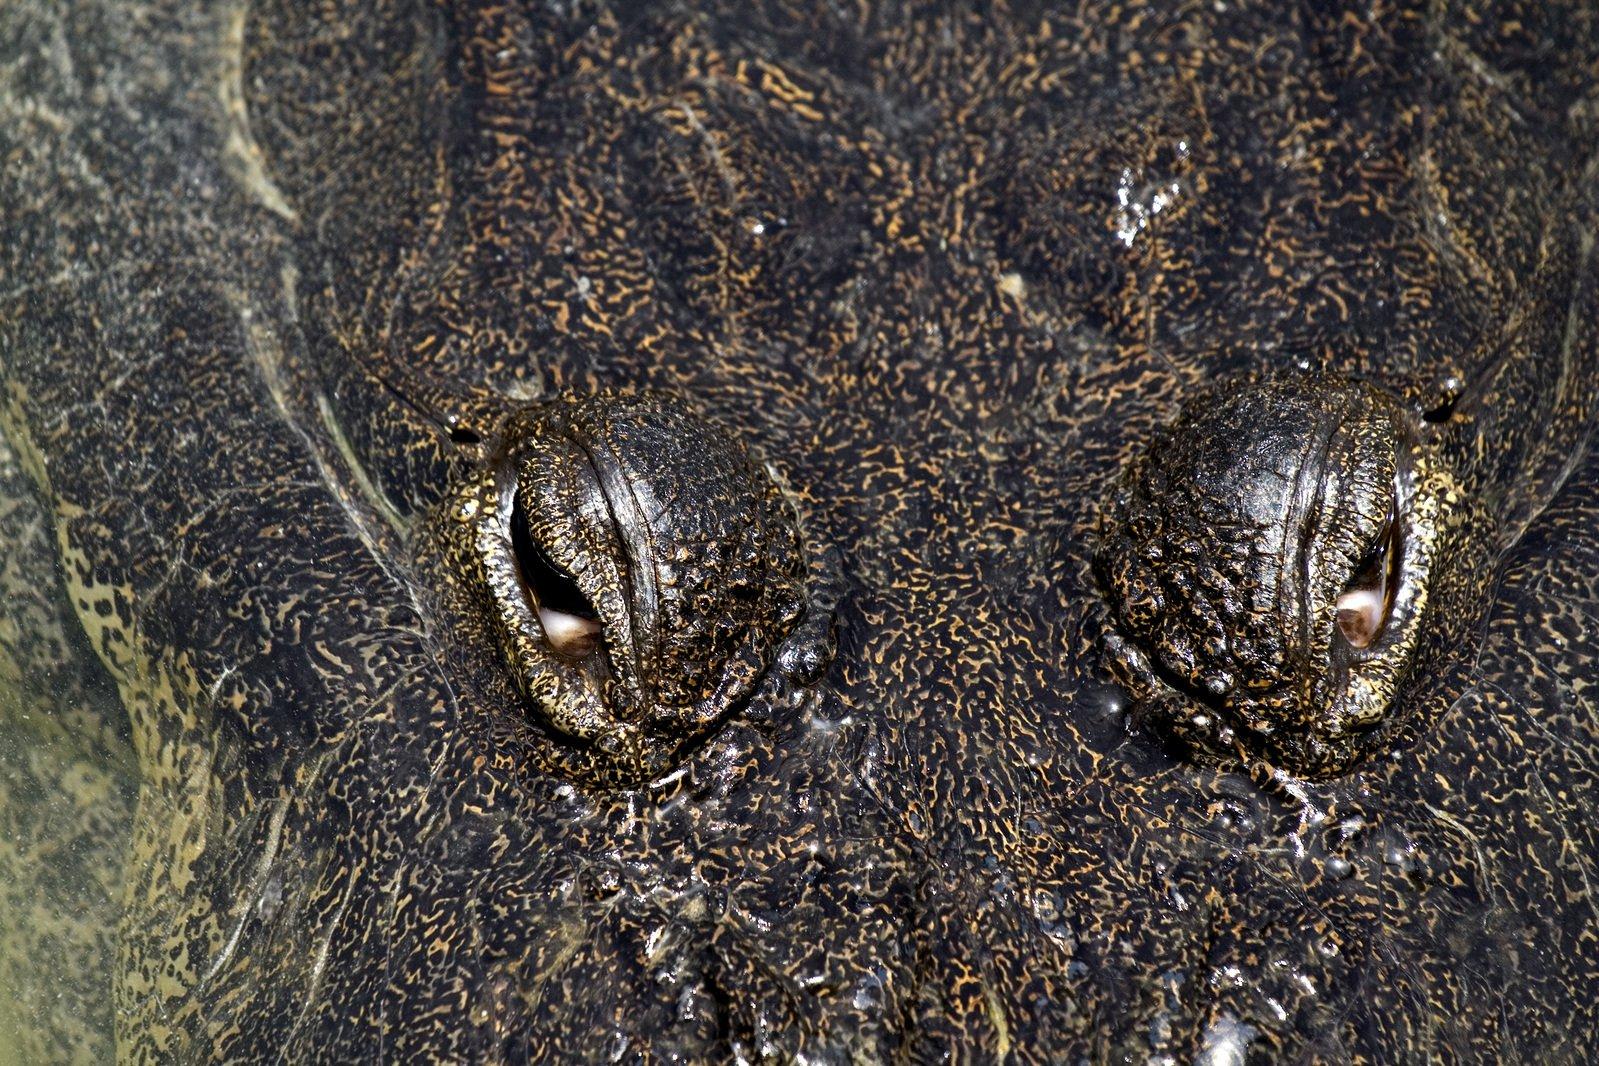 Crocodile eye close up